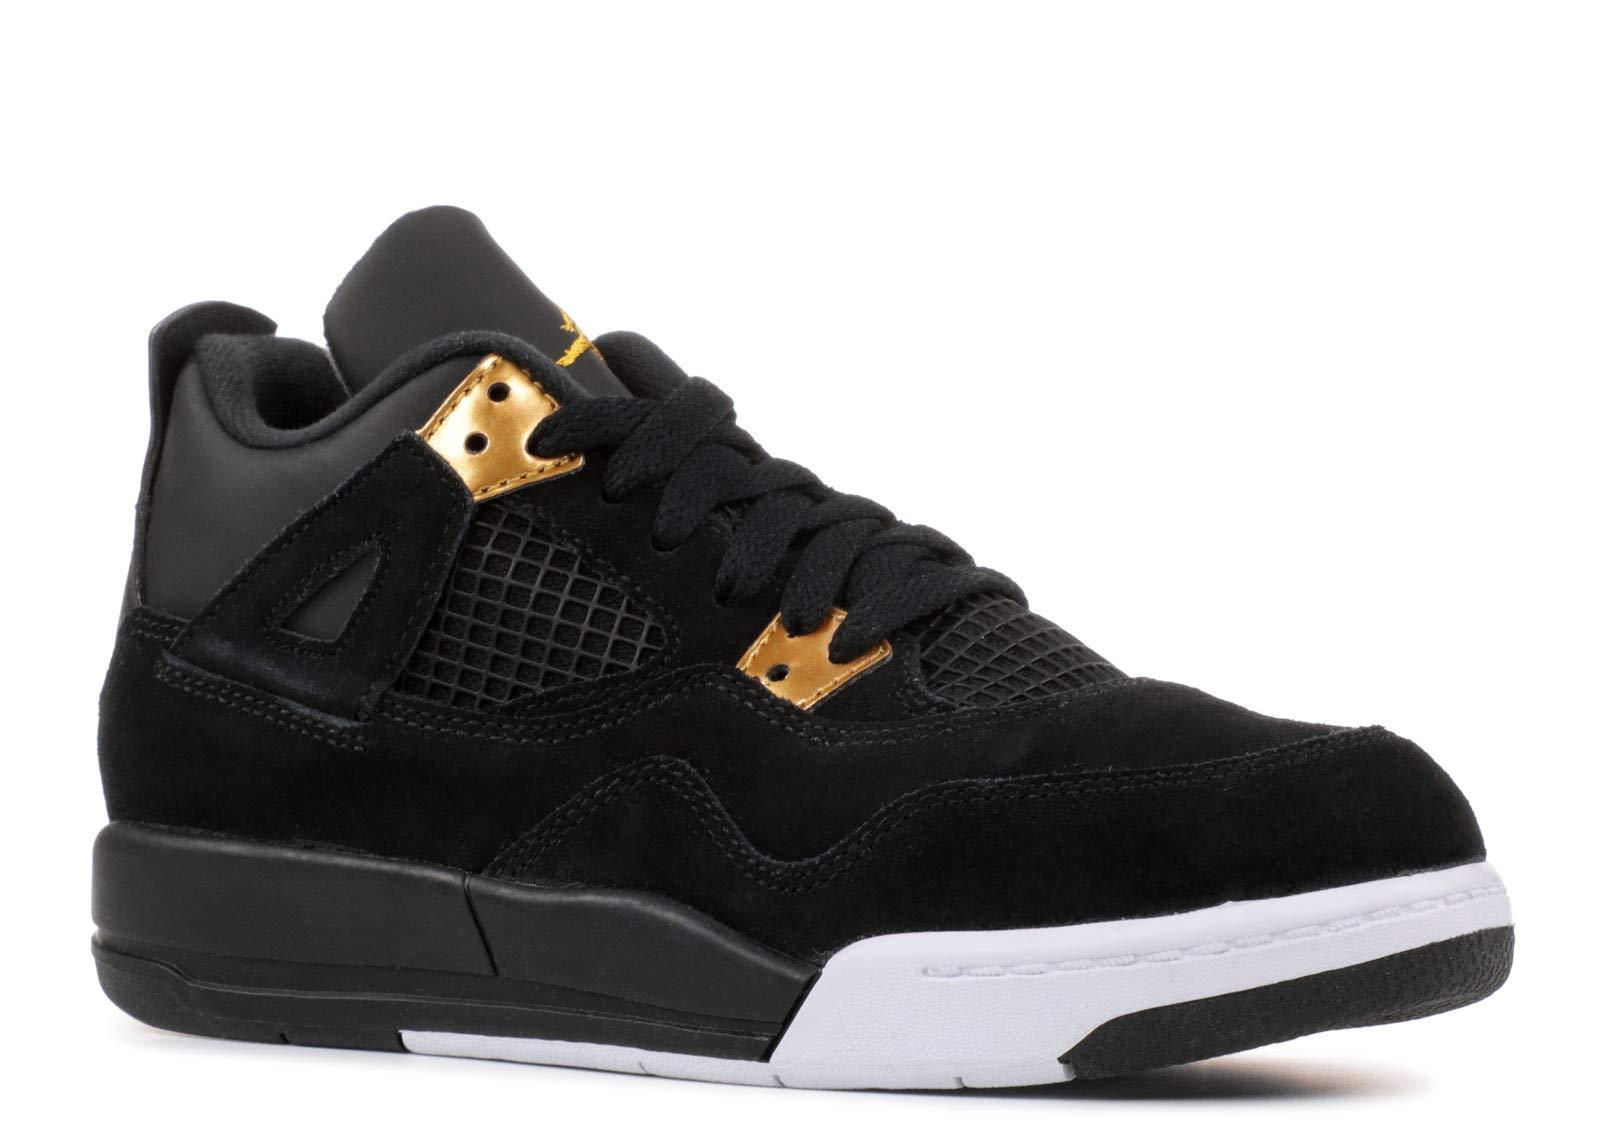 52f2abce2174 Galleon - Jordan 4 Retro BP Little Kids Shoes 3 M US Black Metallic Gold White  308499-032